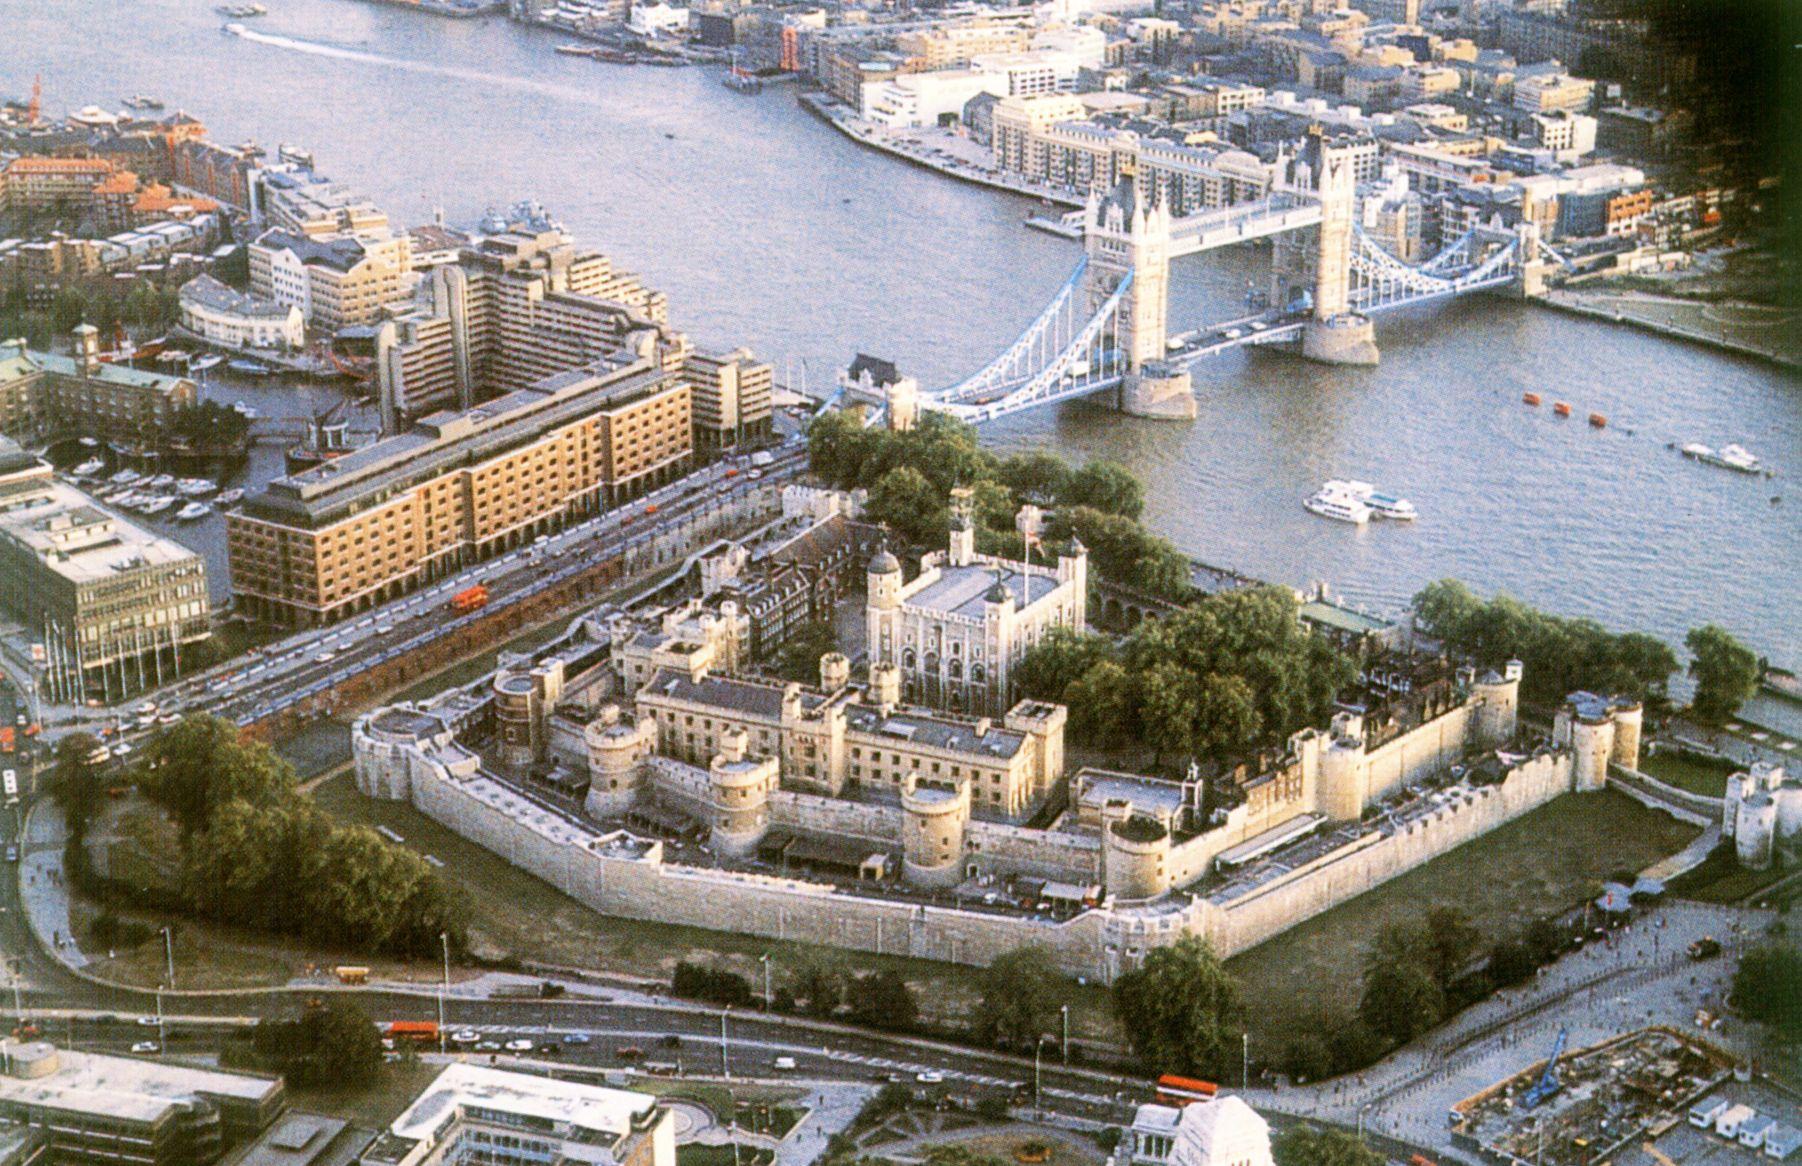 Velká Británie - Anglie - letecký pohled na střed Londýna